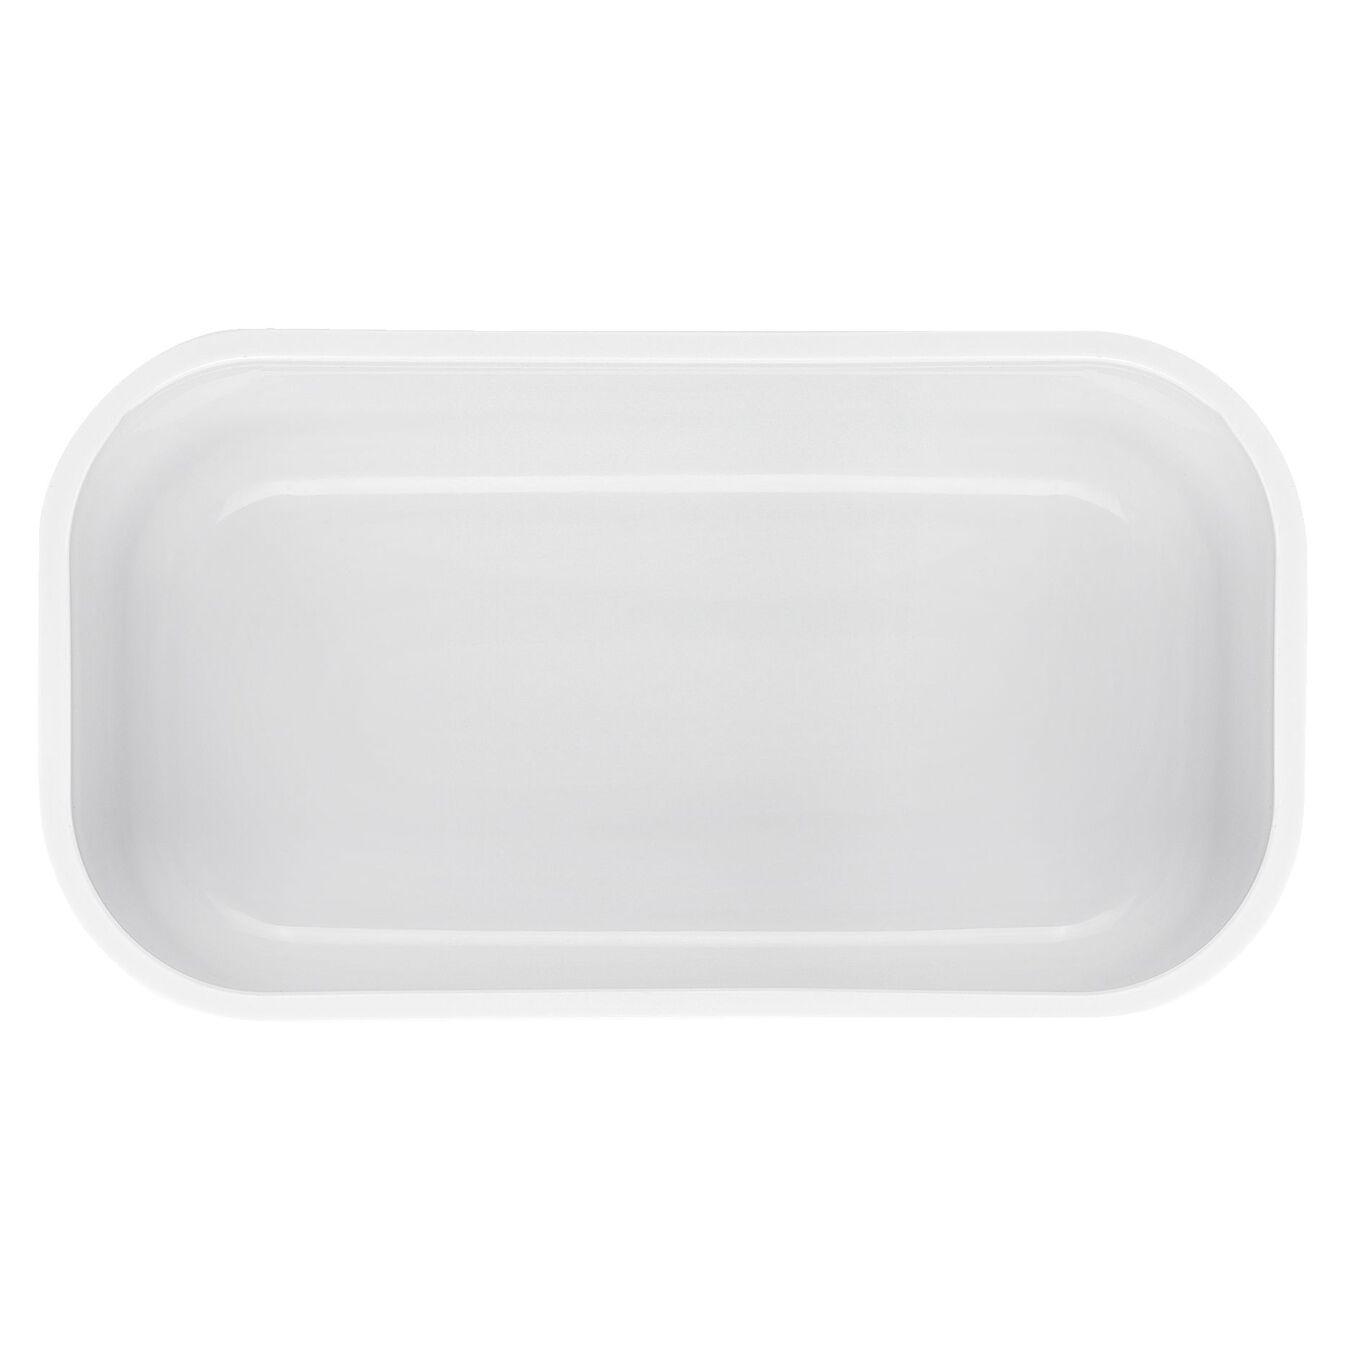 Vakuum Lunchbox, S, Kunststoff, Weiß,,large 3